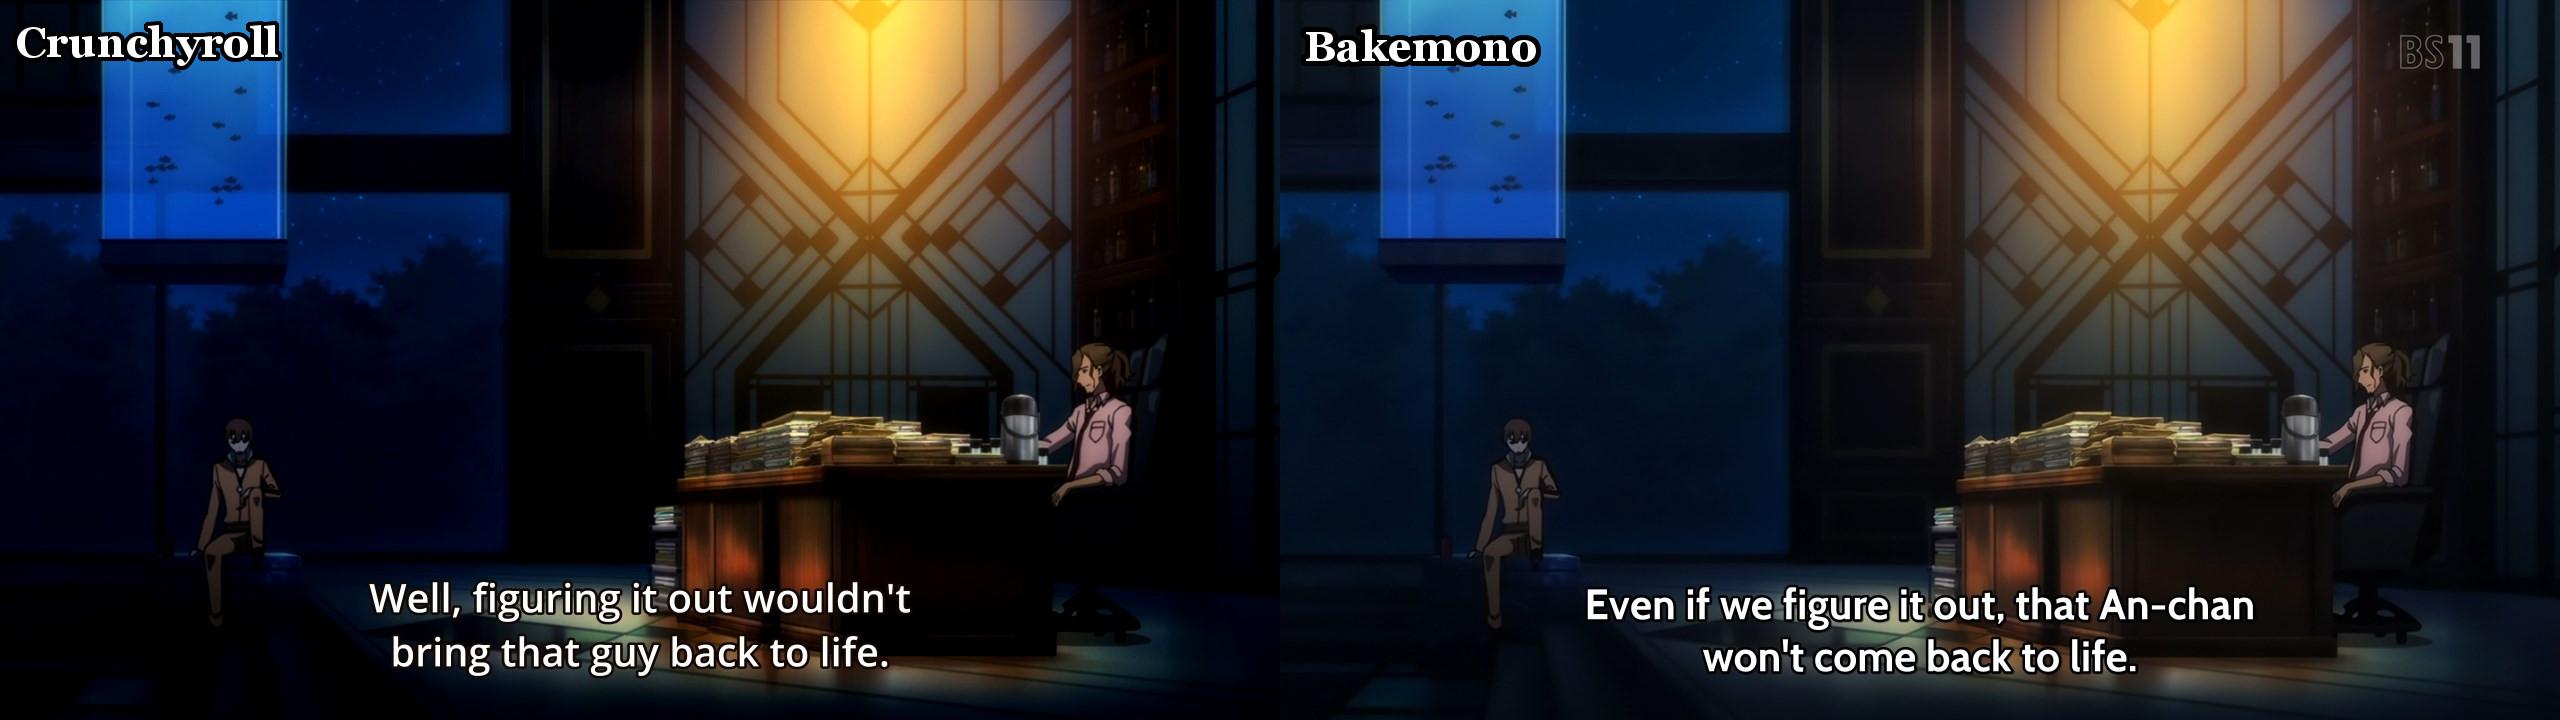 crunchyroll_versus_bakemono_-_trickster_-_0m